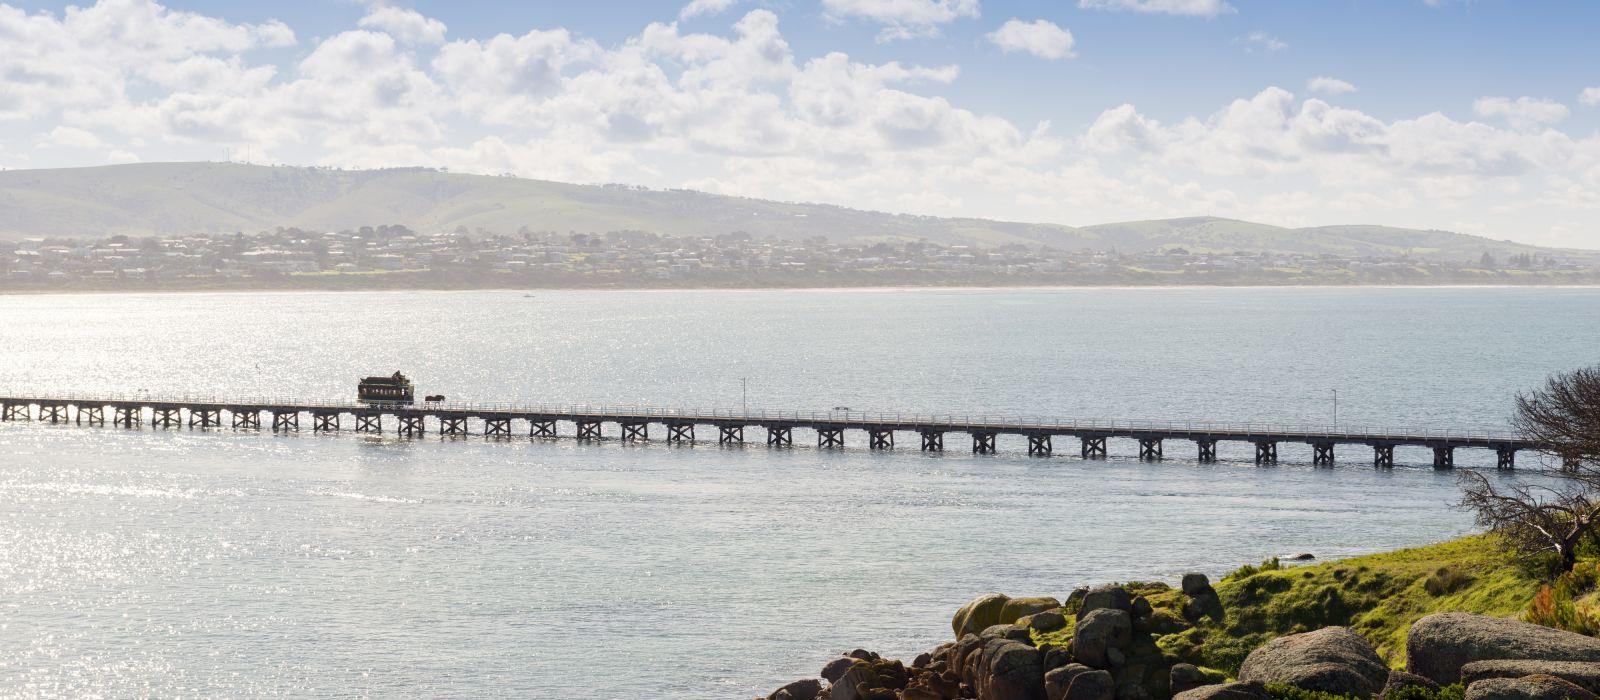 Reiseziel Victor Harbor Australien